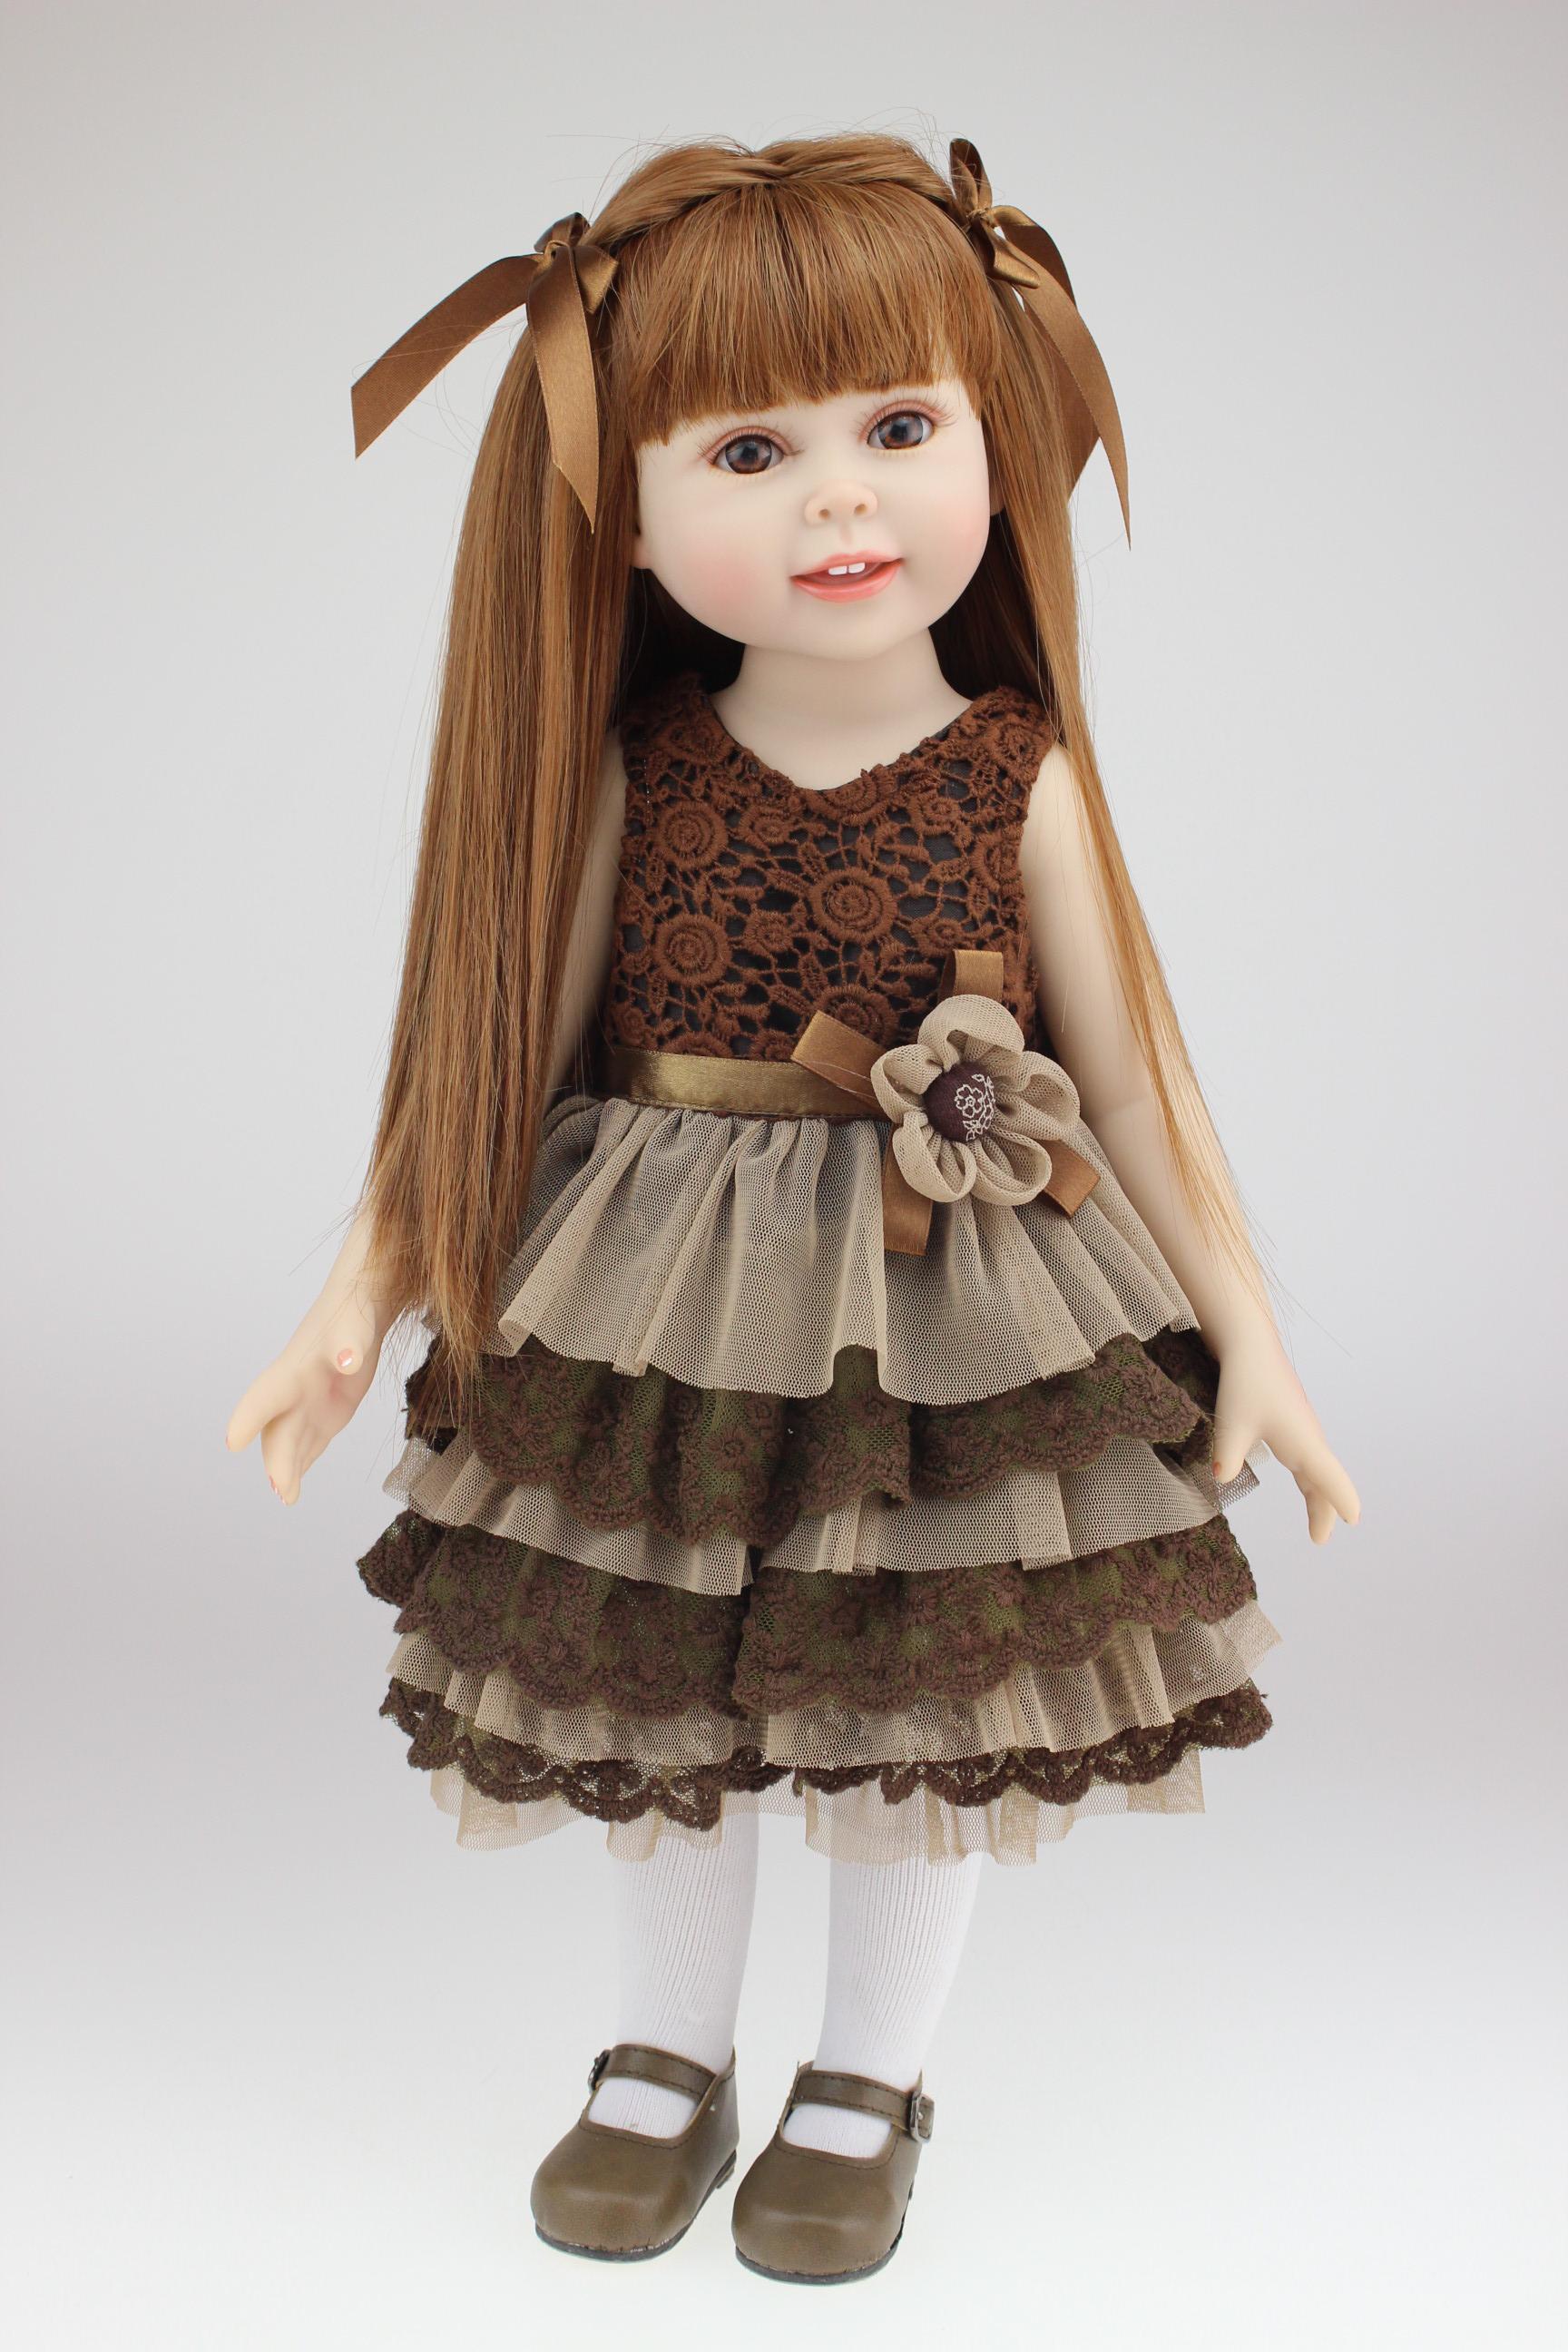 18 45cm fashion very cute semi soft vinyl american doll education